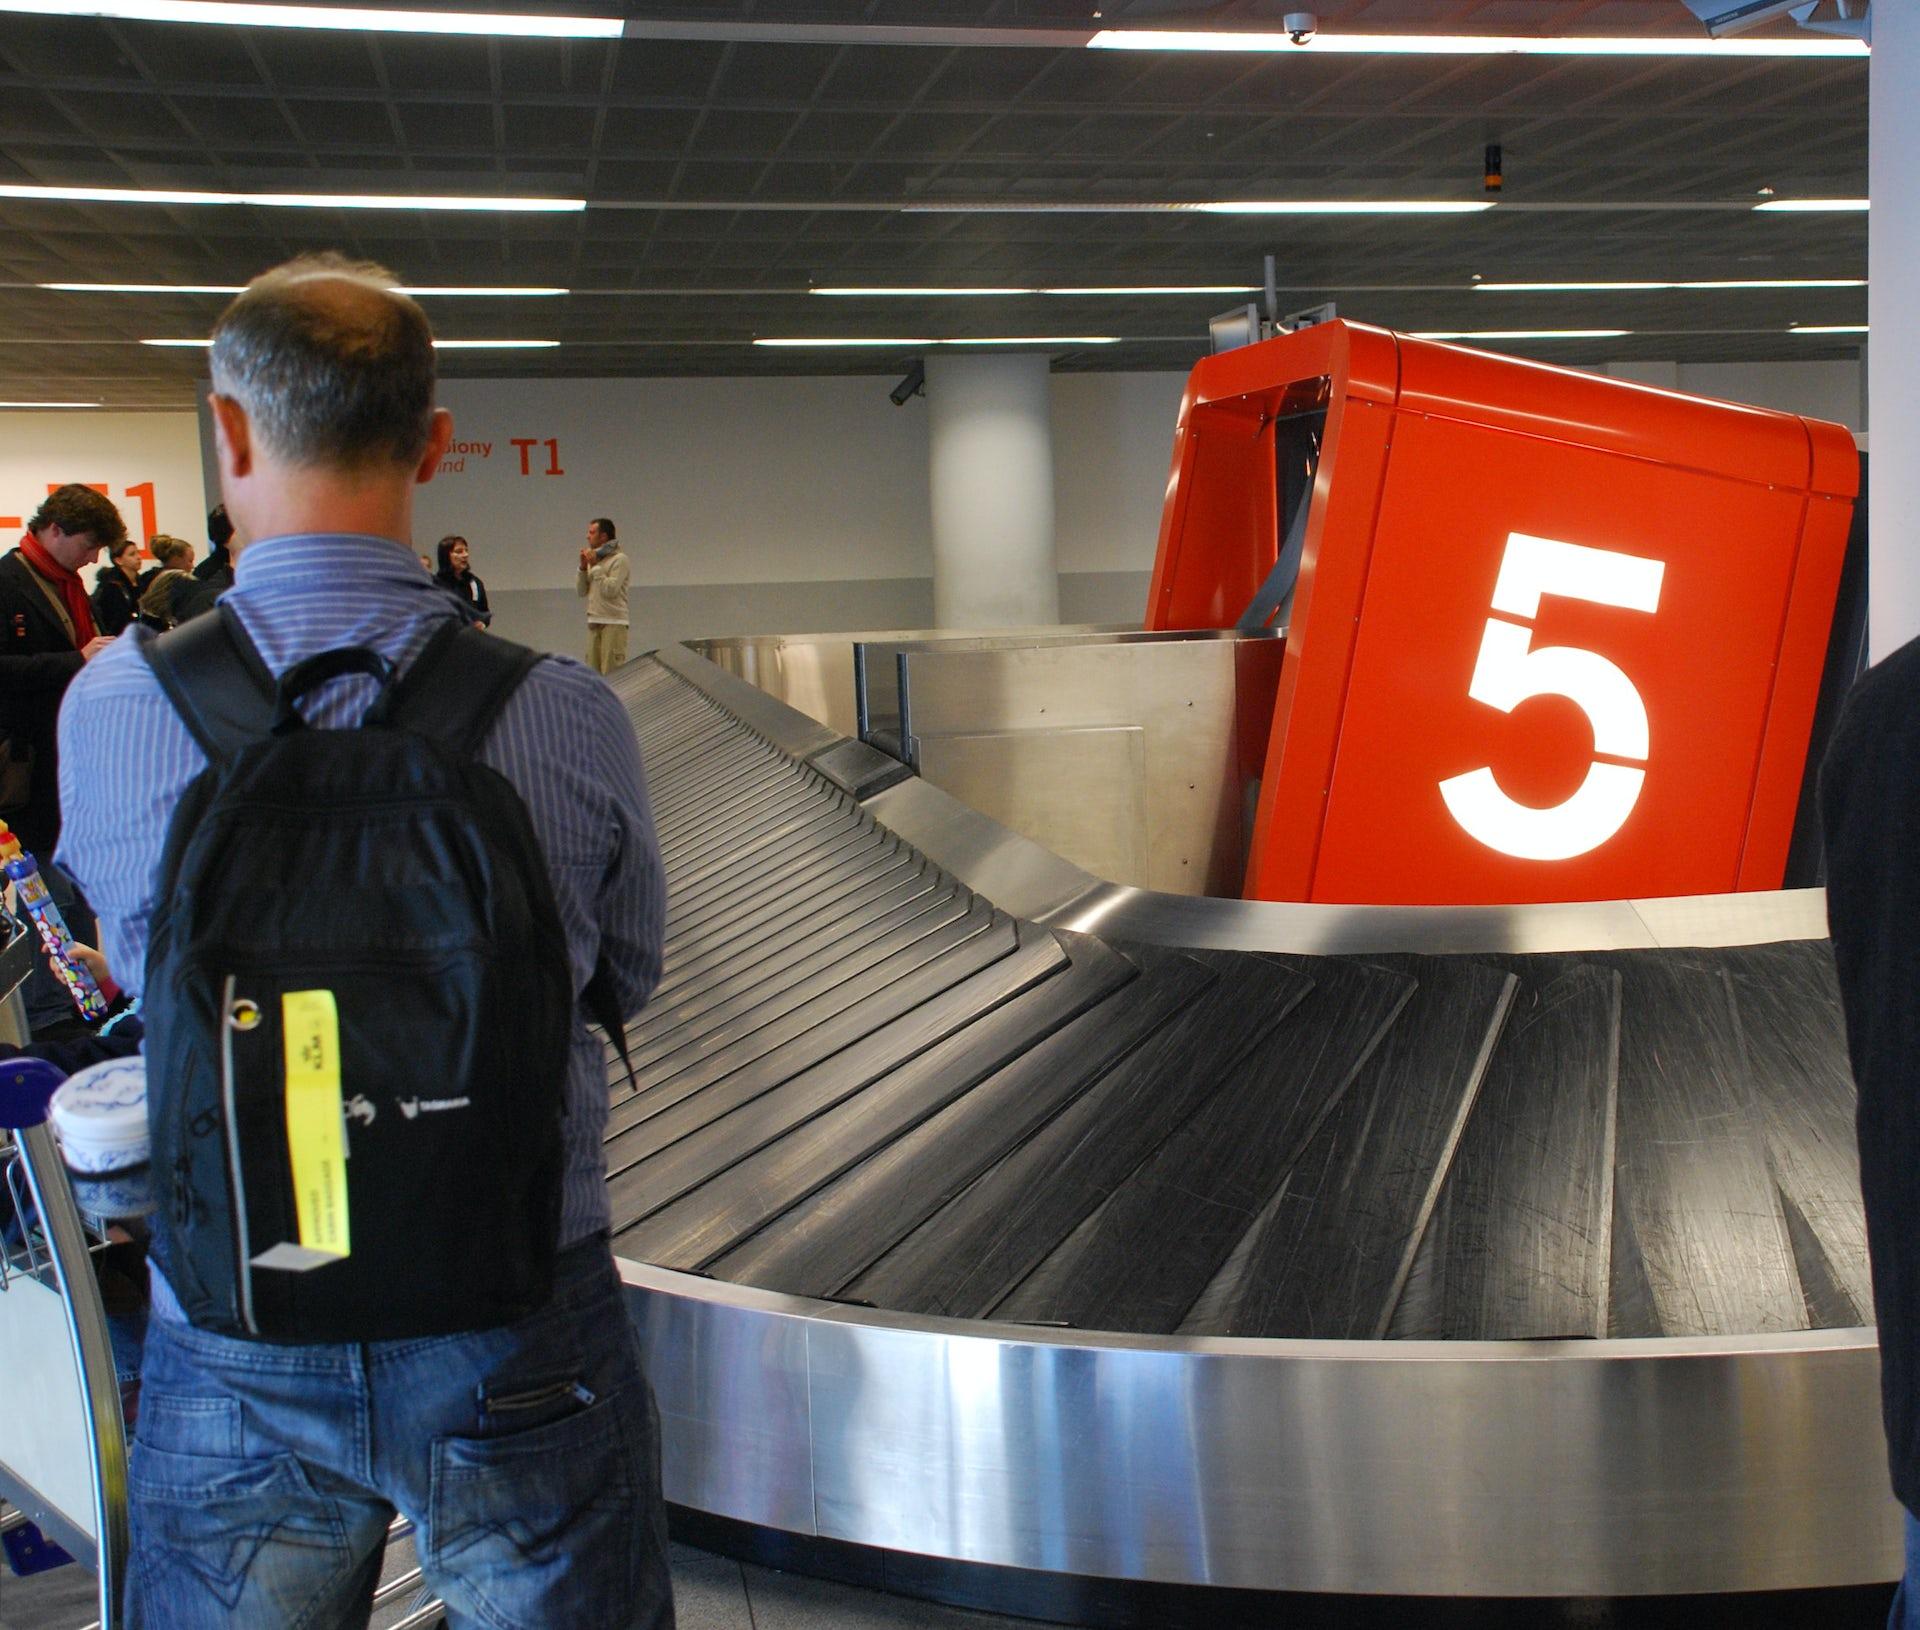 dating startup founder compensation for delayed baggage delta